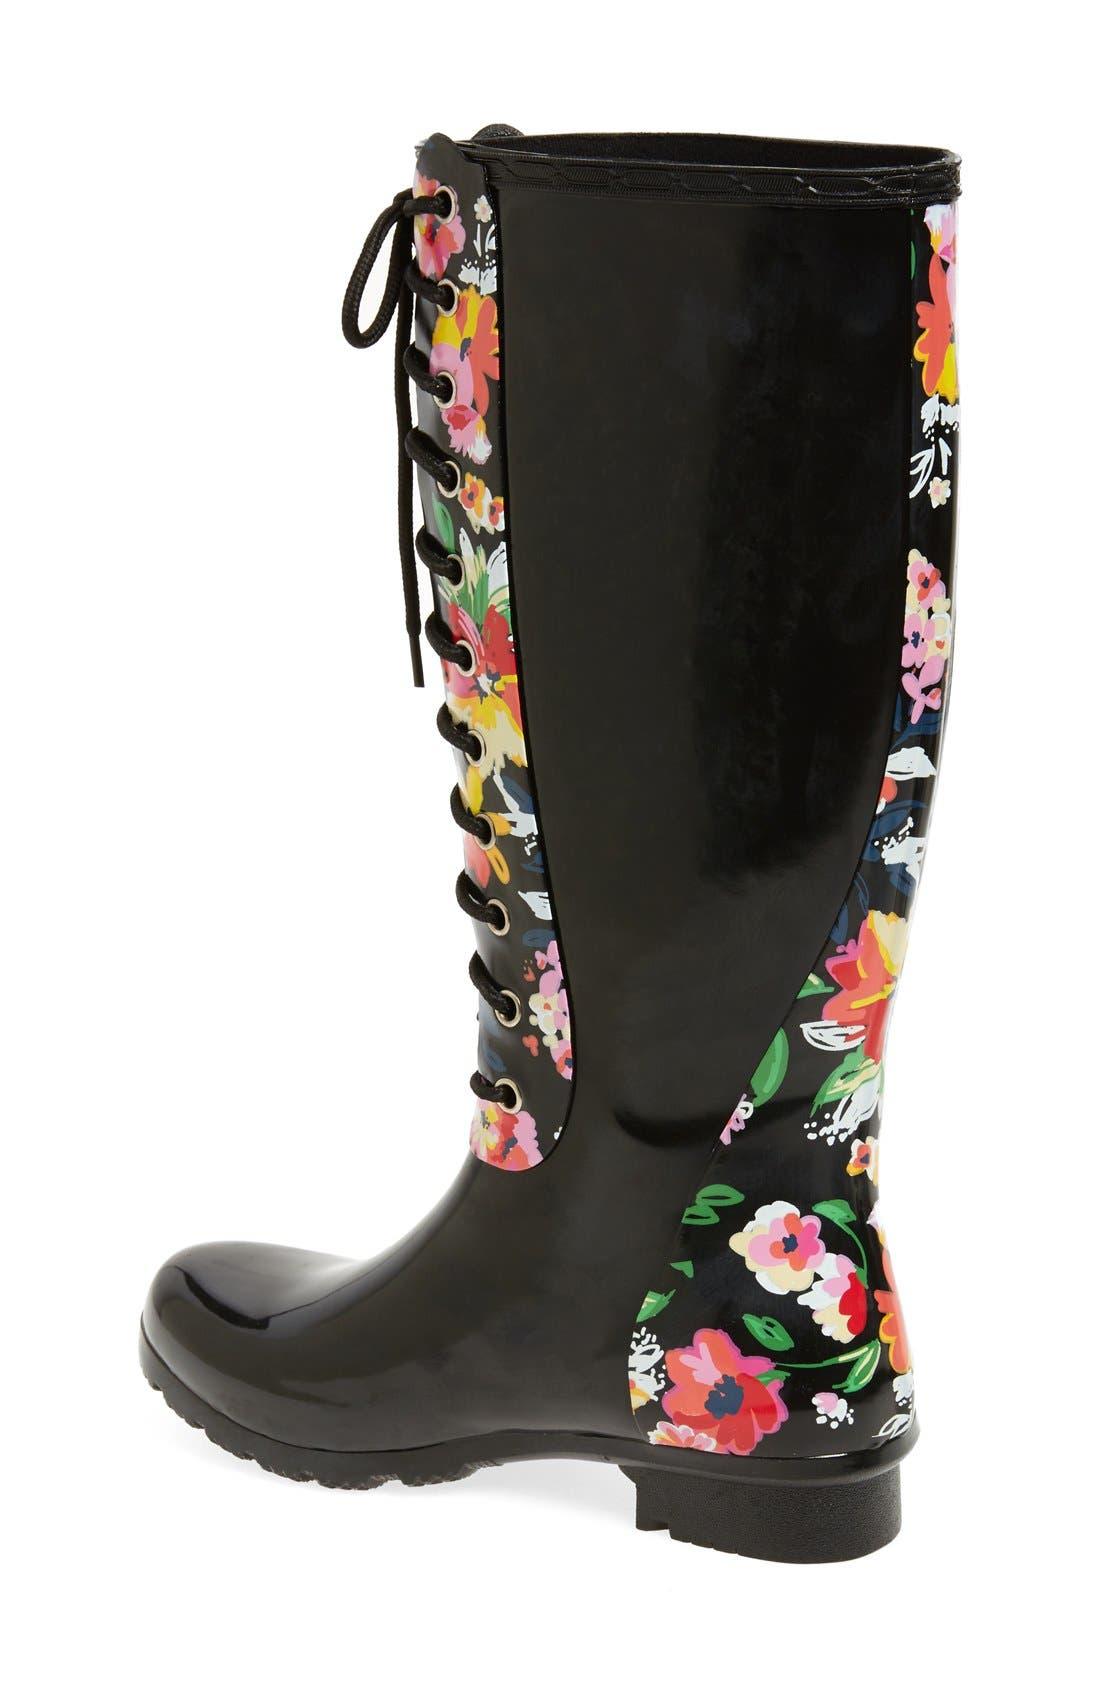 'Opinca' Waterproof Rain Boot,                             Alternate thumbnail 2, color,                             003